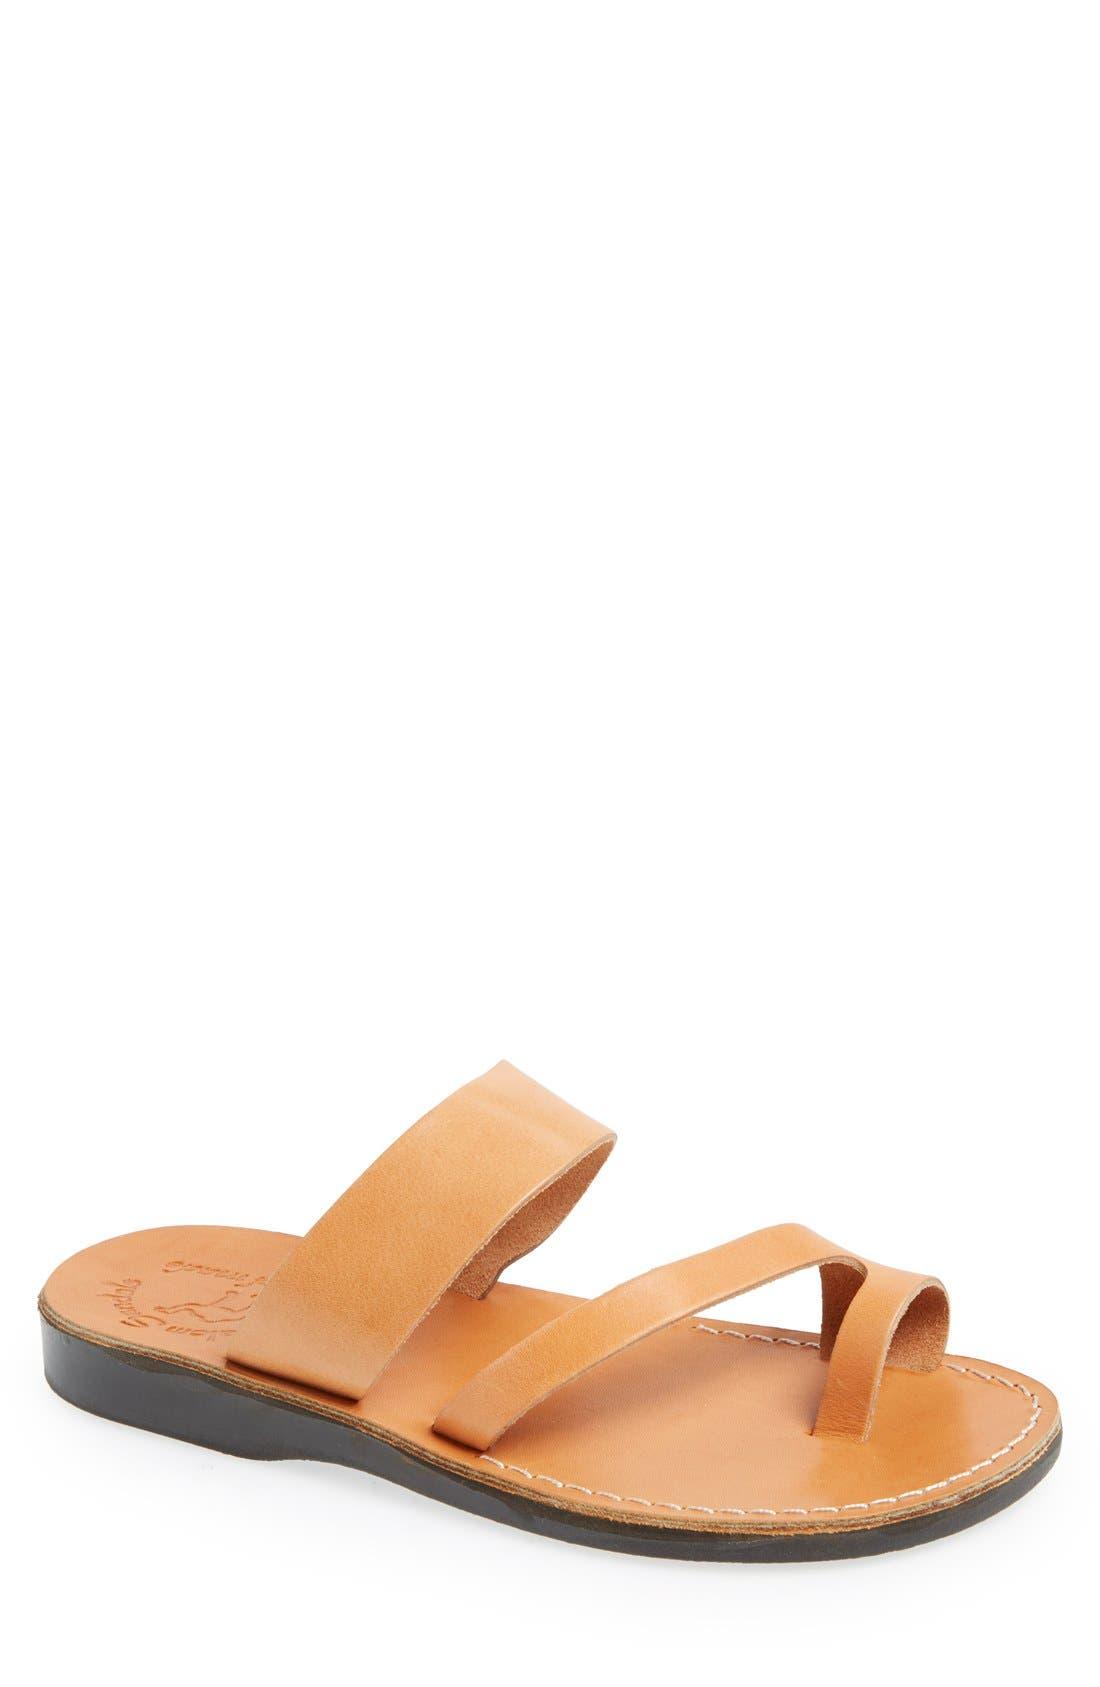 'Zohar' Leather Sandal,                         Main,                         color, Tan